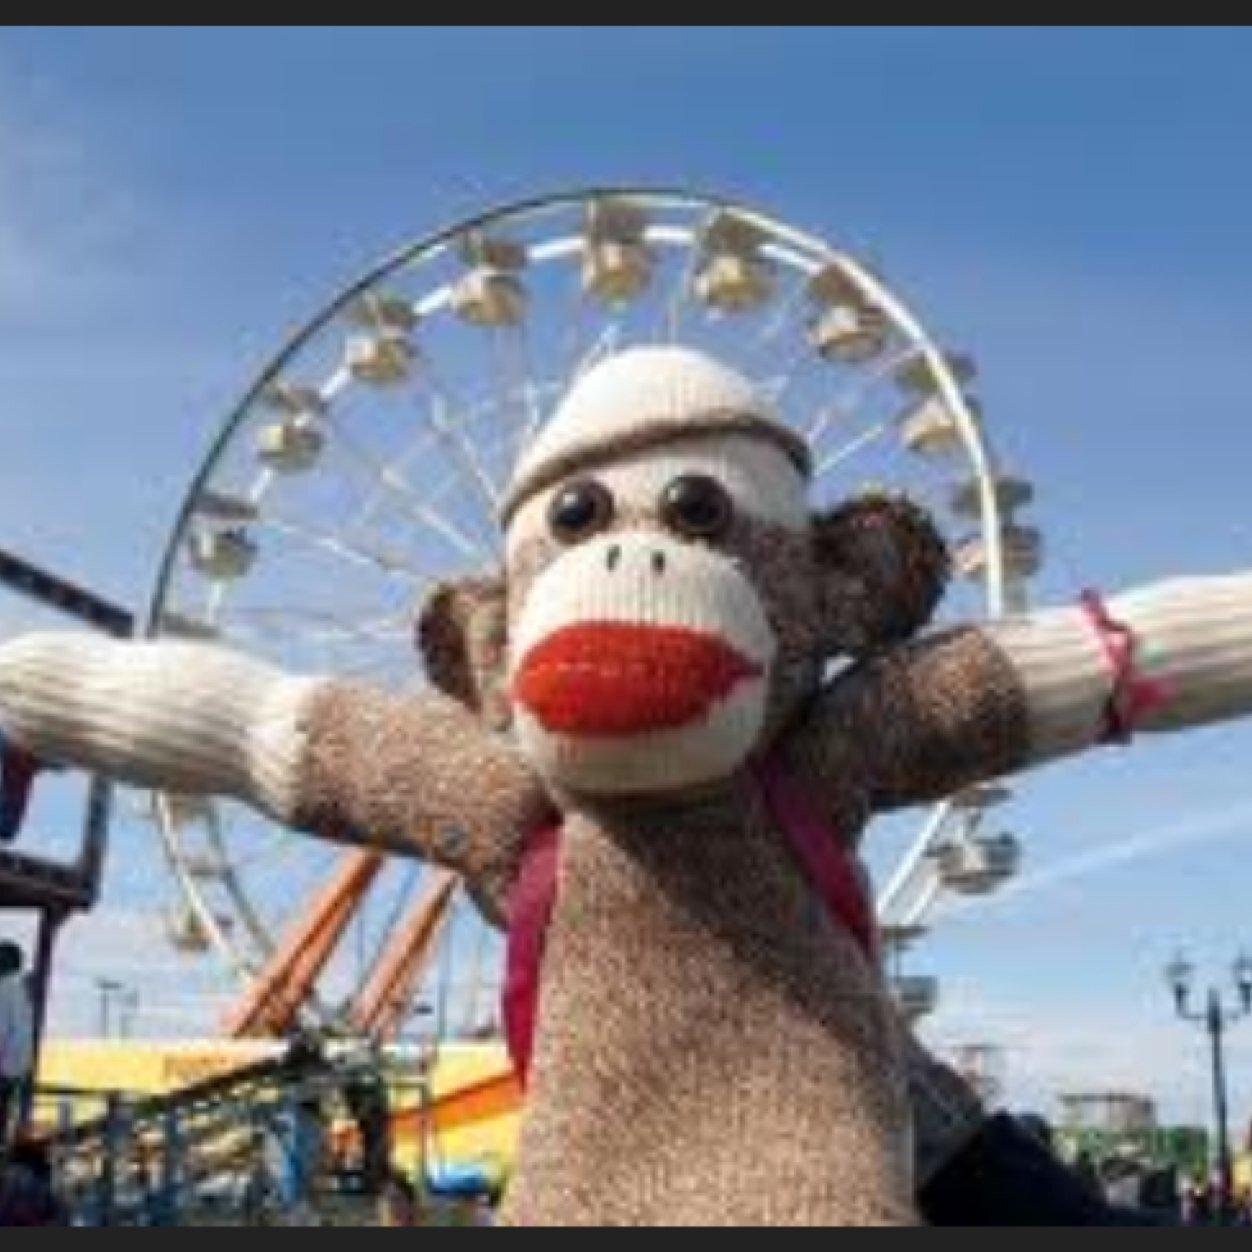 Sock monkey porn seems